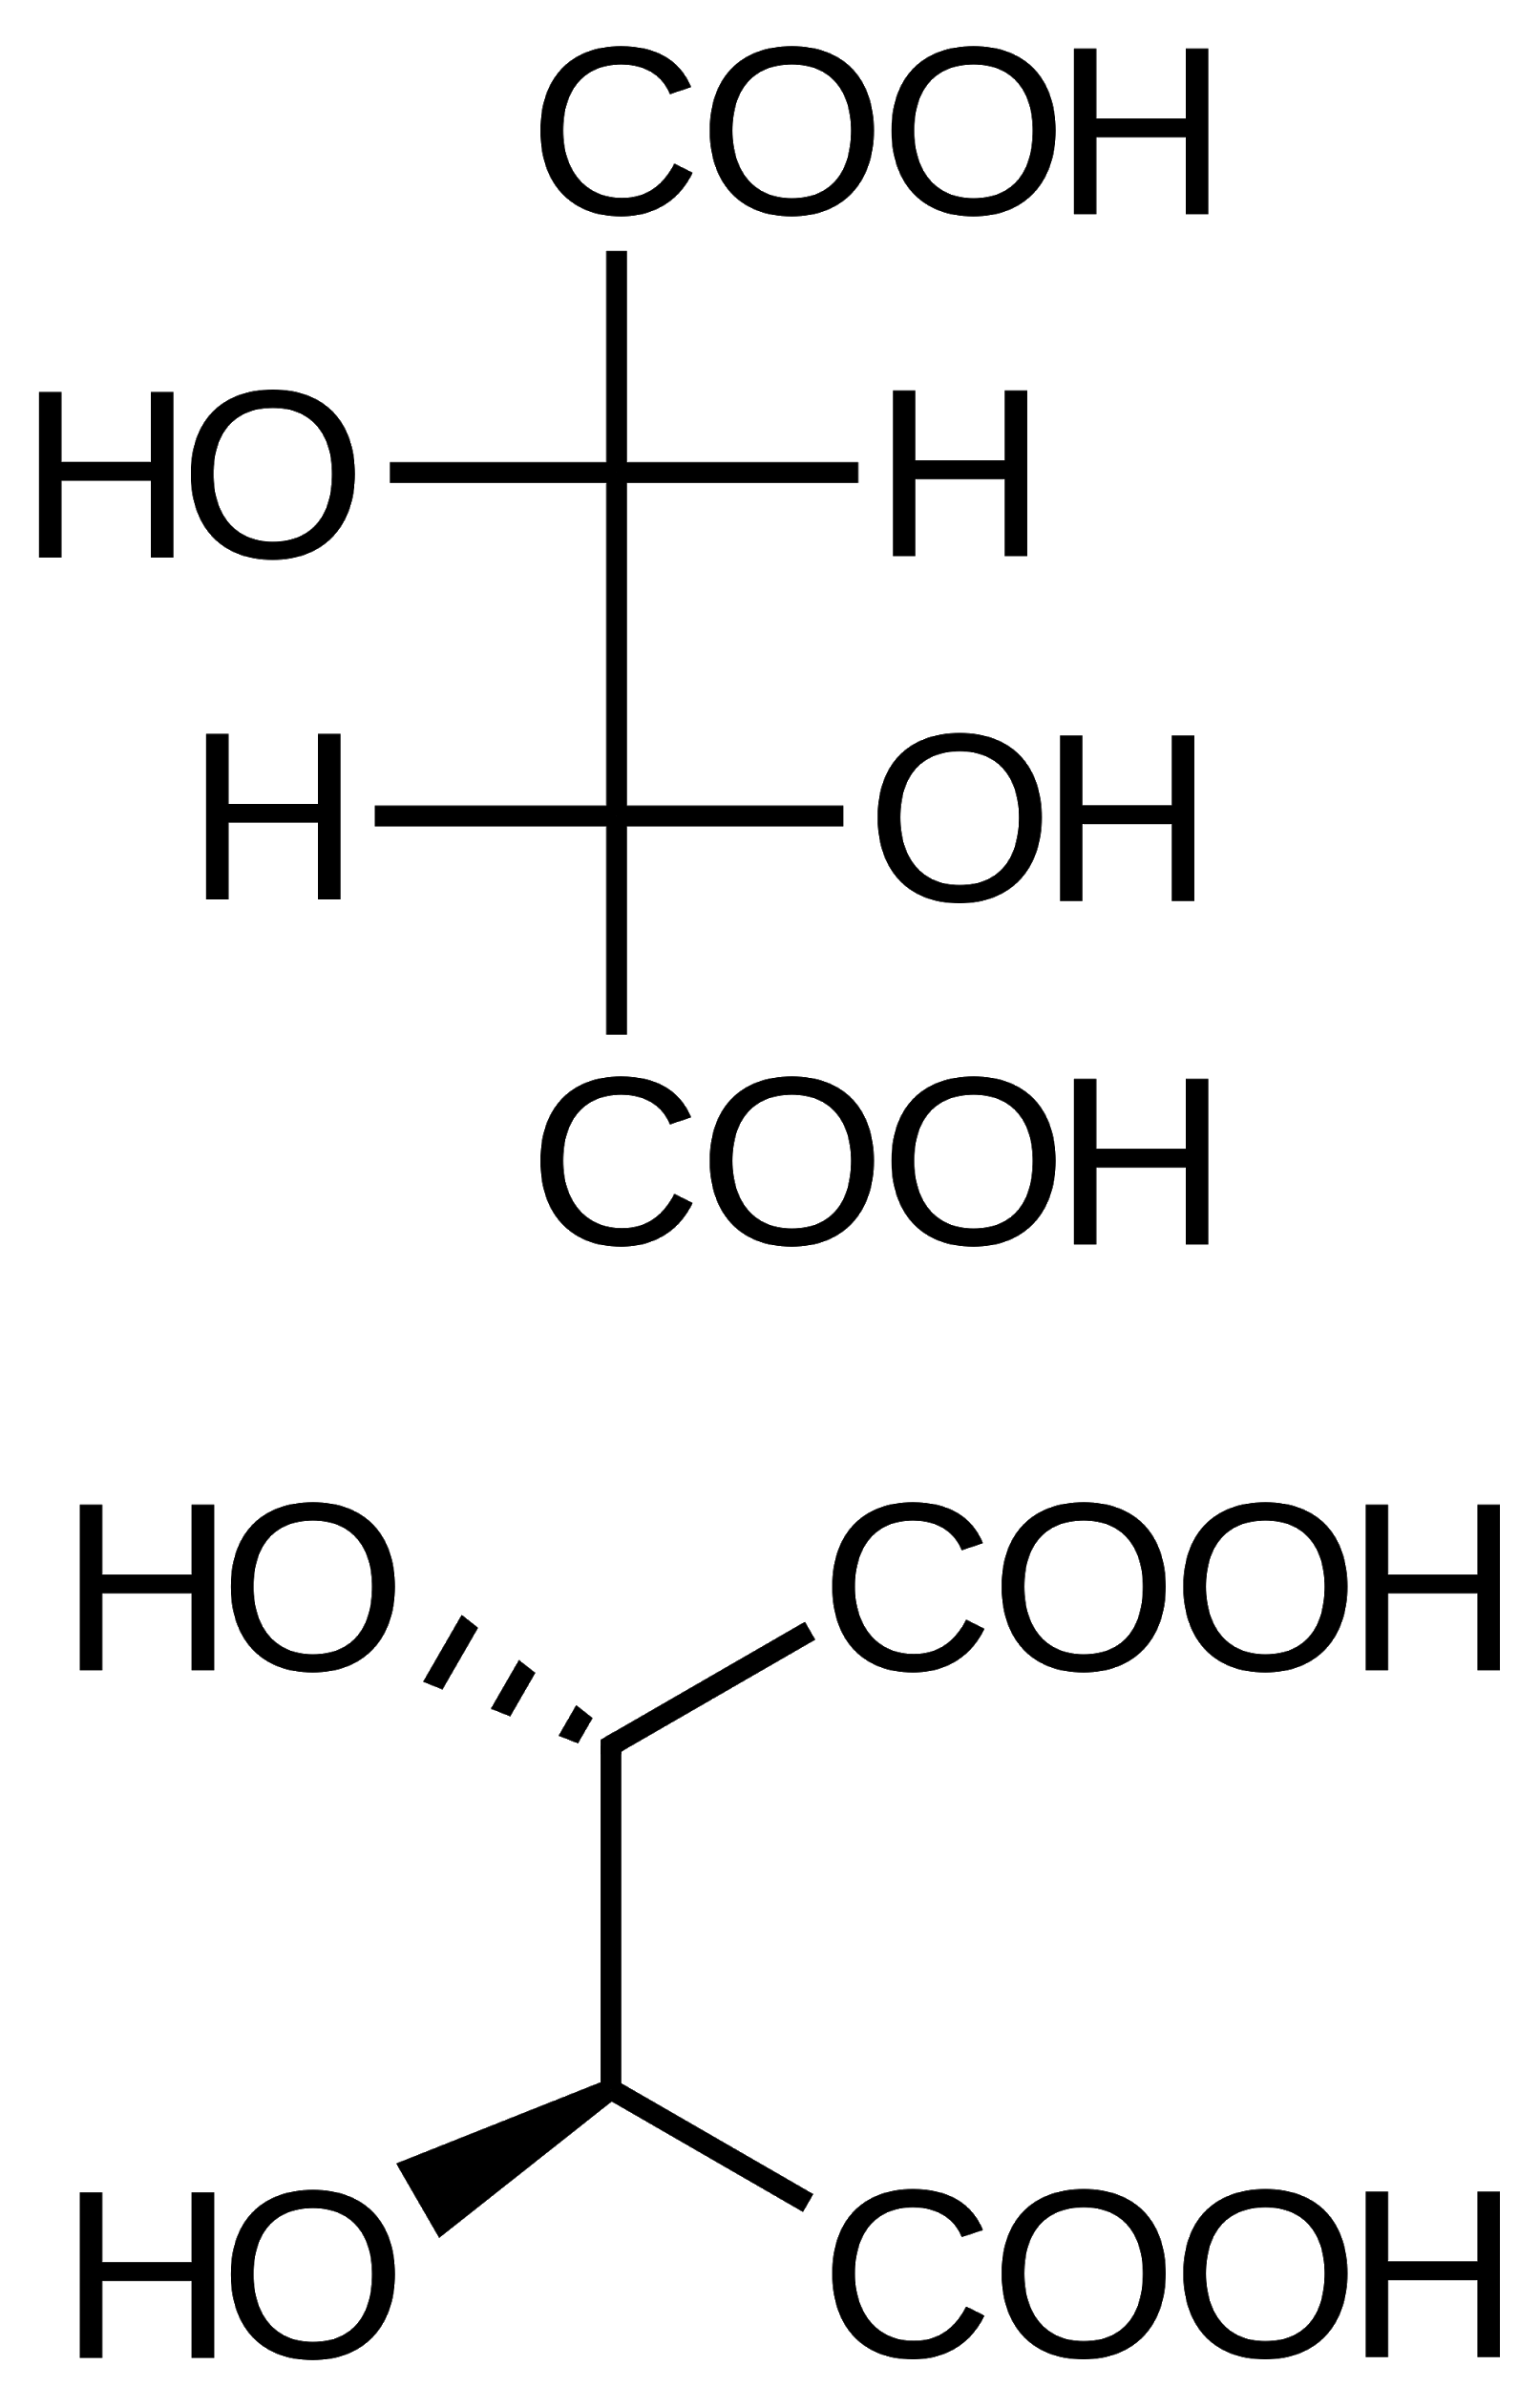 Structure of D-tartaric Acid